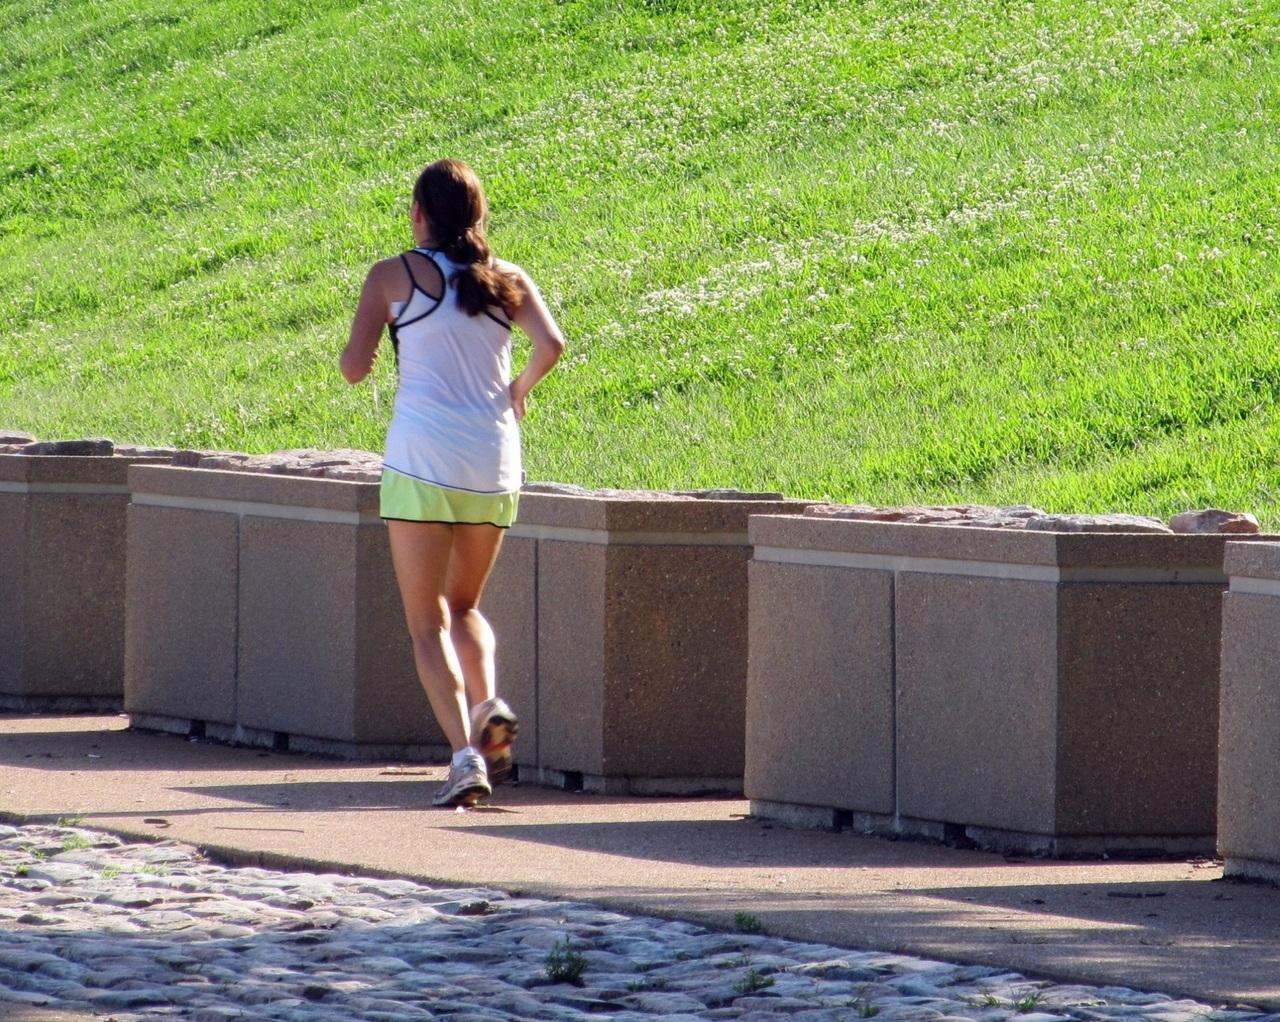 Ejercicio fisico mujer running